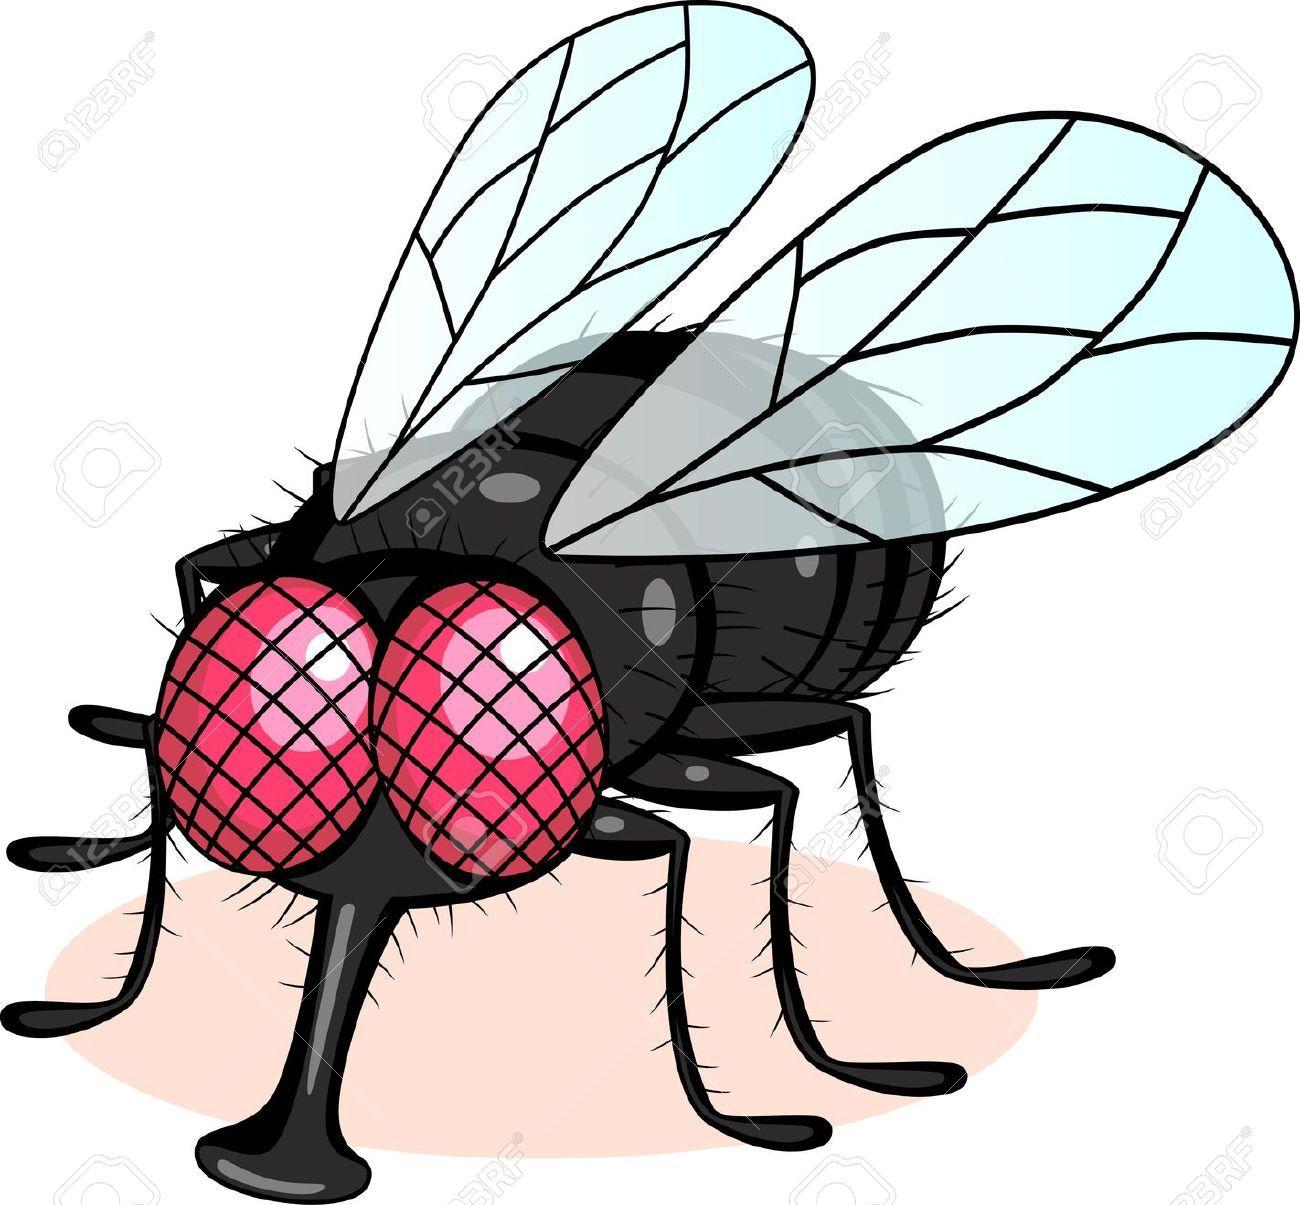 Fly clipart comic. Stock vector in thegioidongvat